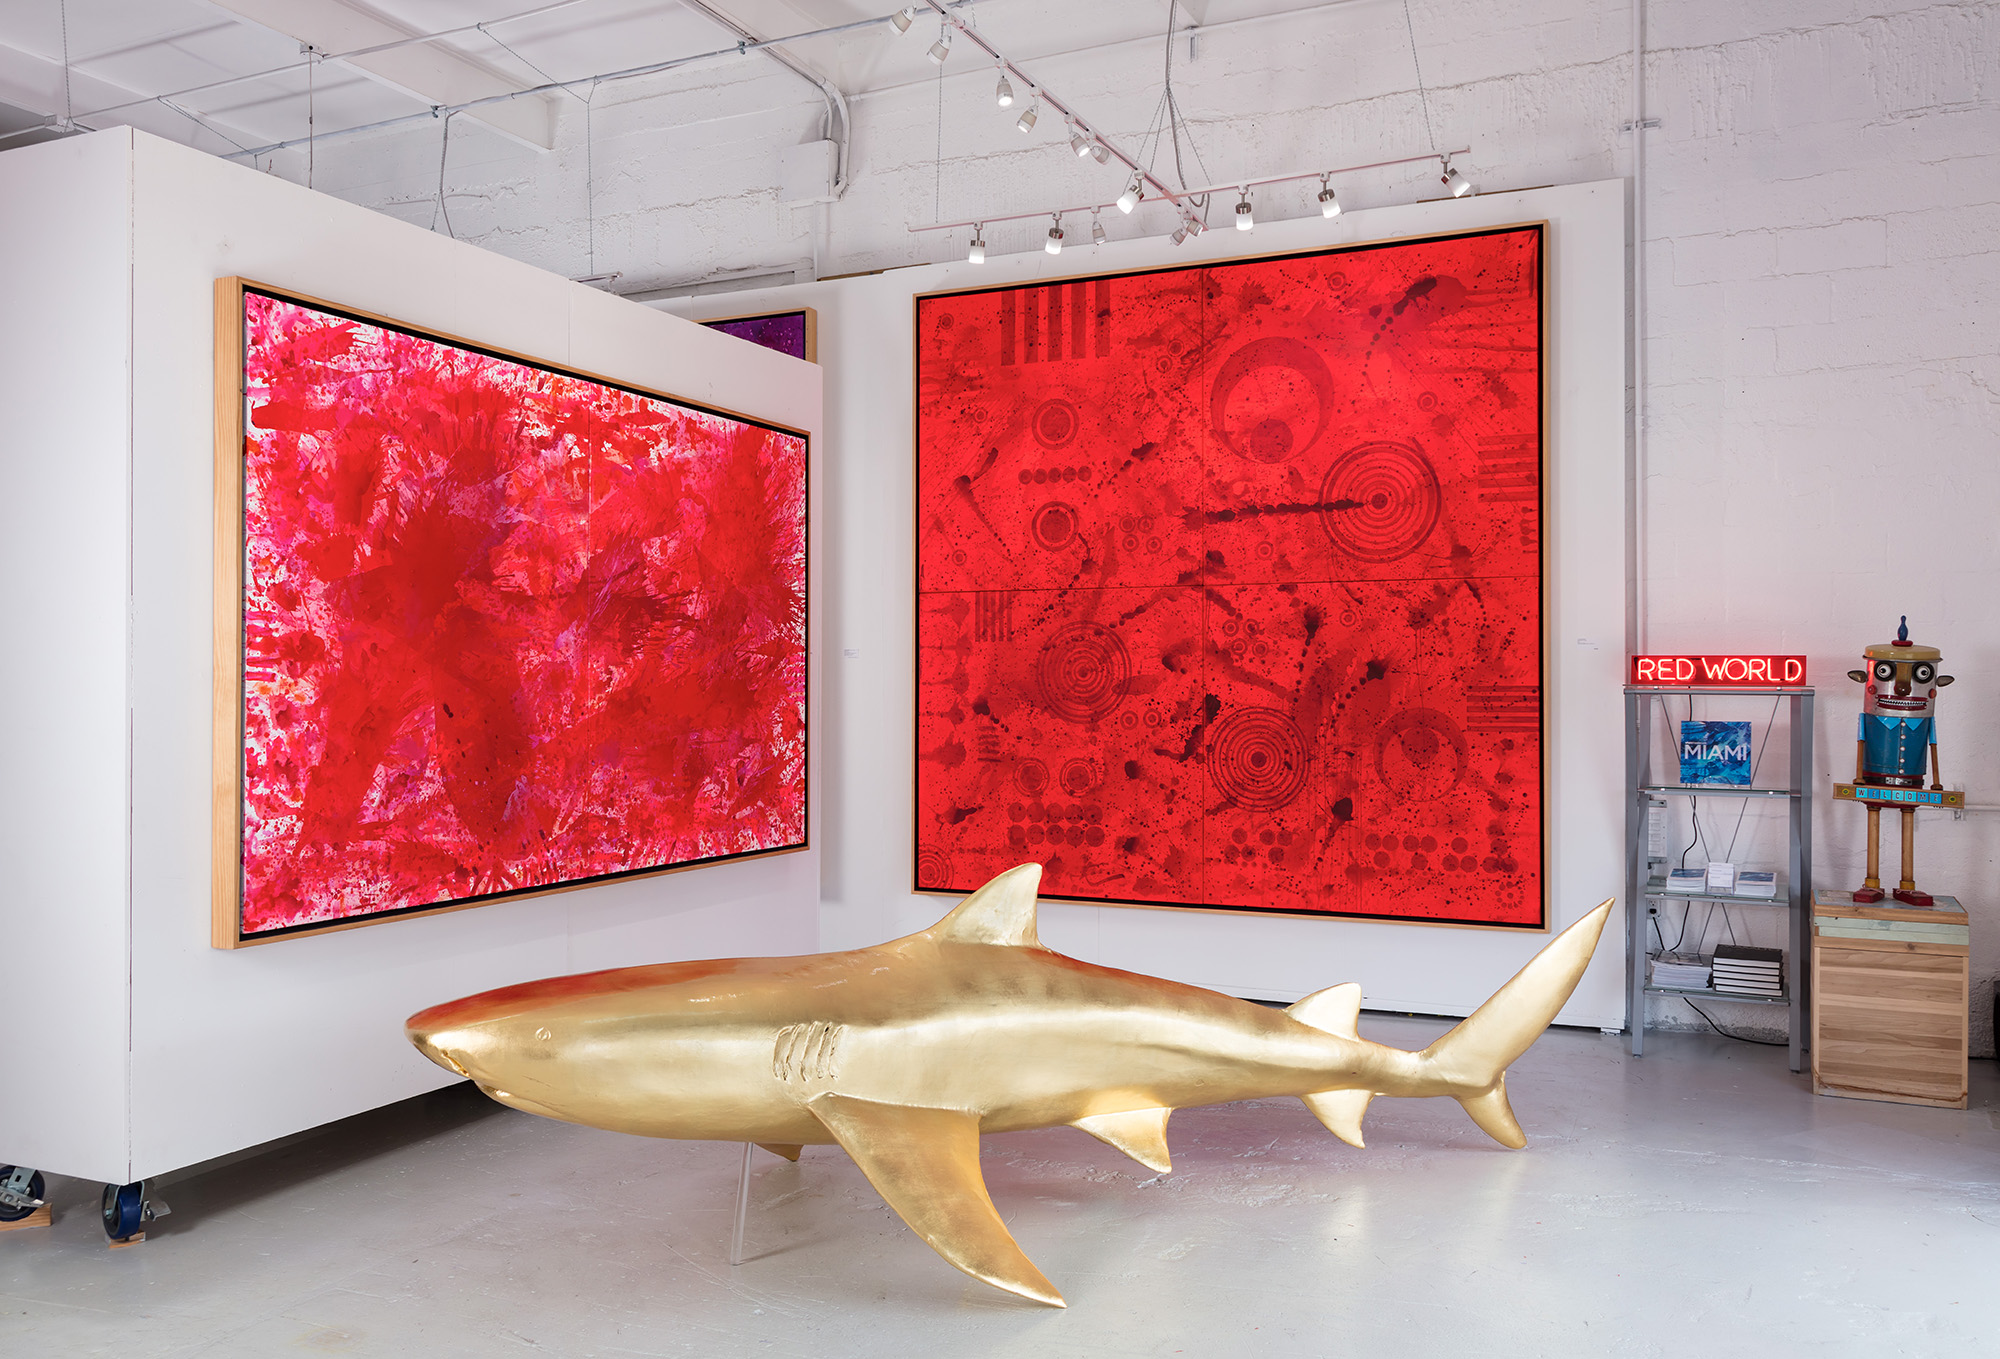 Redworld, 2015, Redworld Glaze, 2017 (left to right)